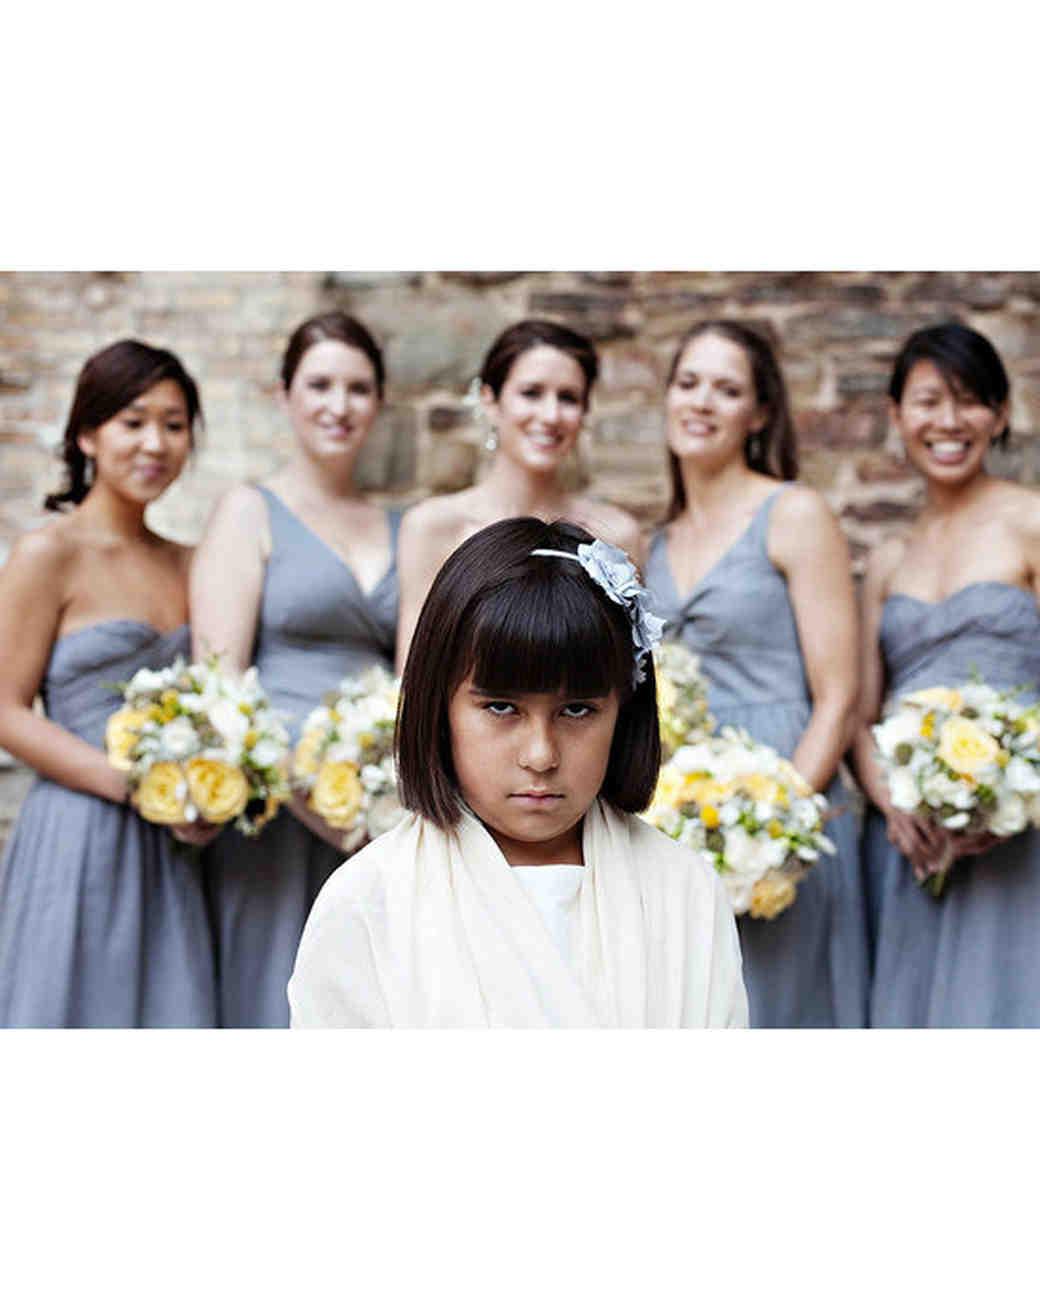 hilarious-wedding-photos-frowning-flower-girl-1115.jpg